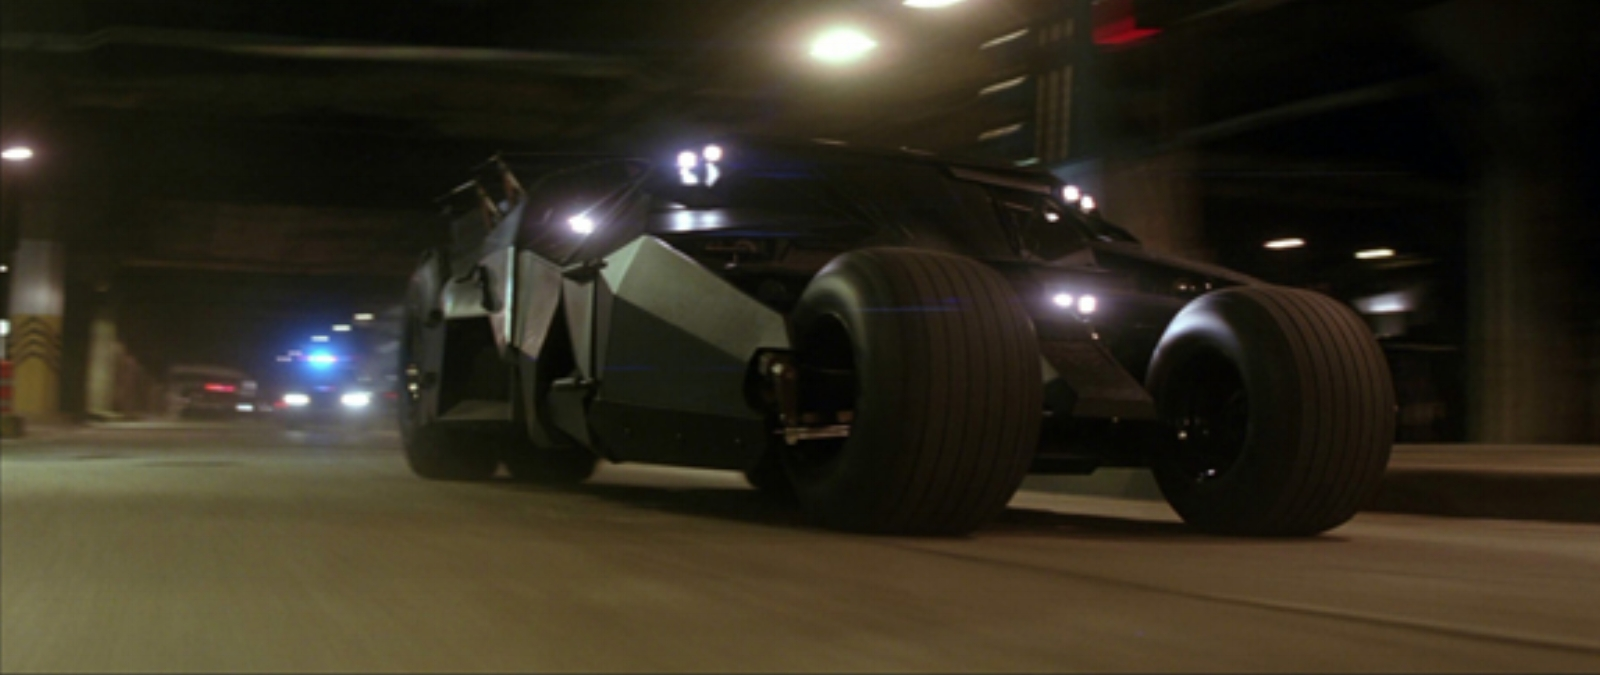 batman-begins-tumbler.jpg